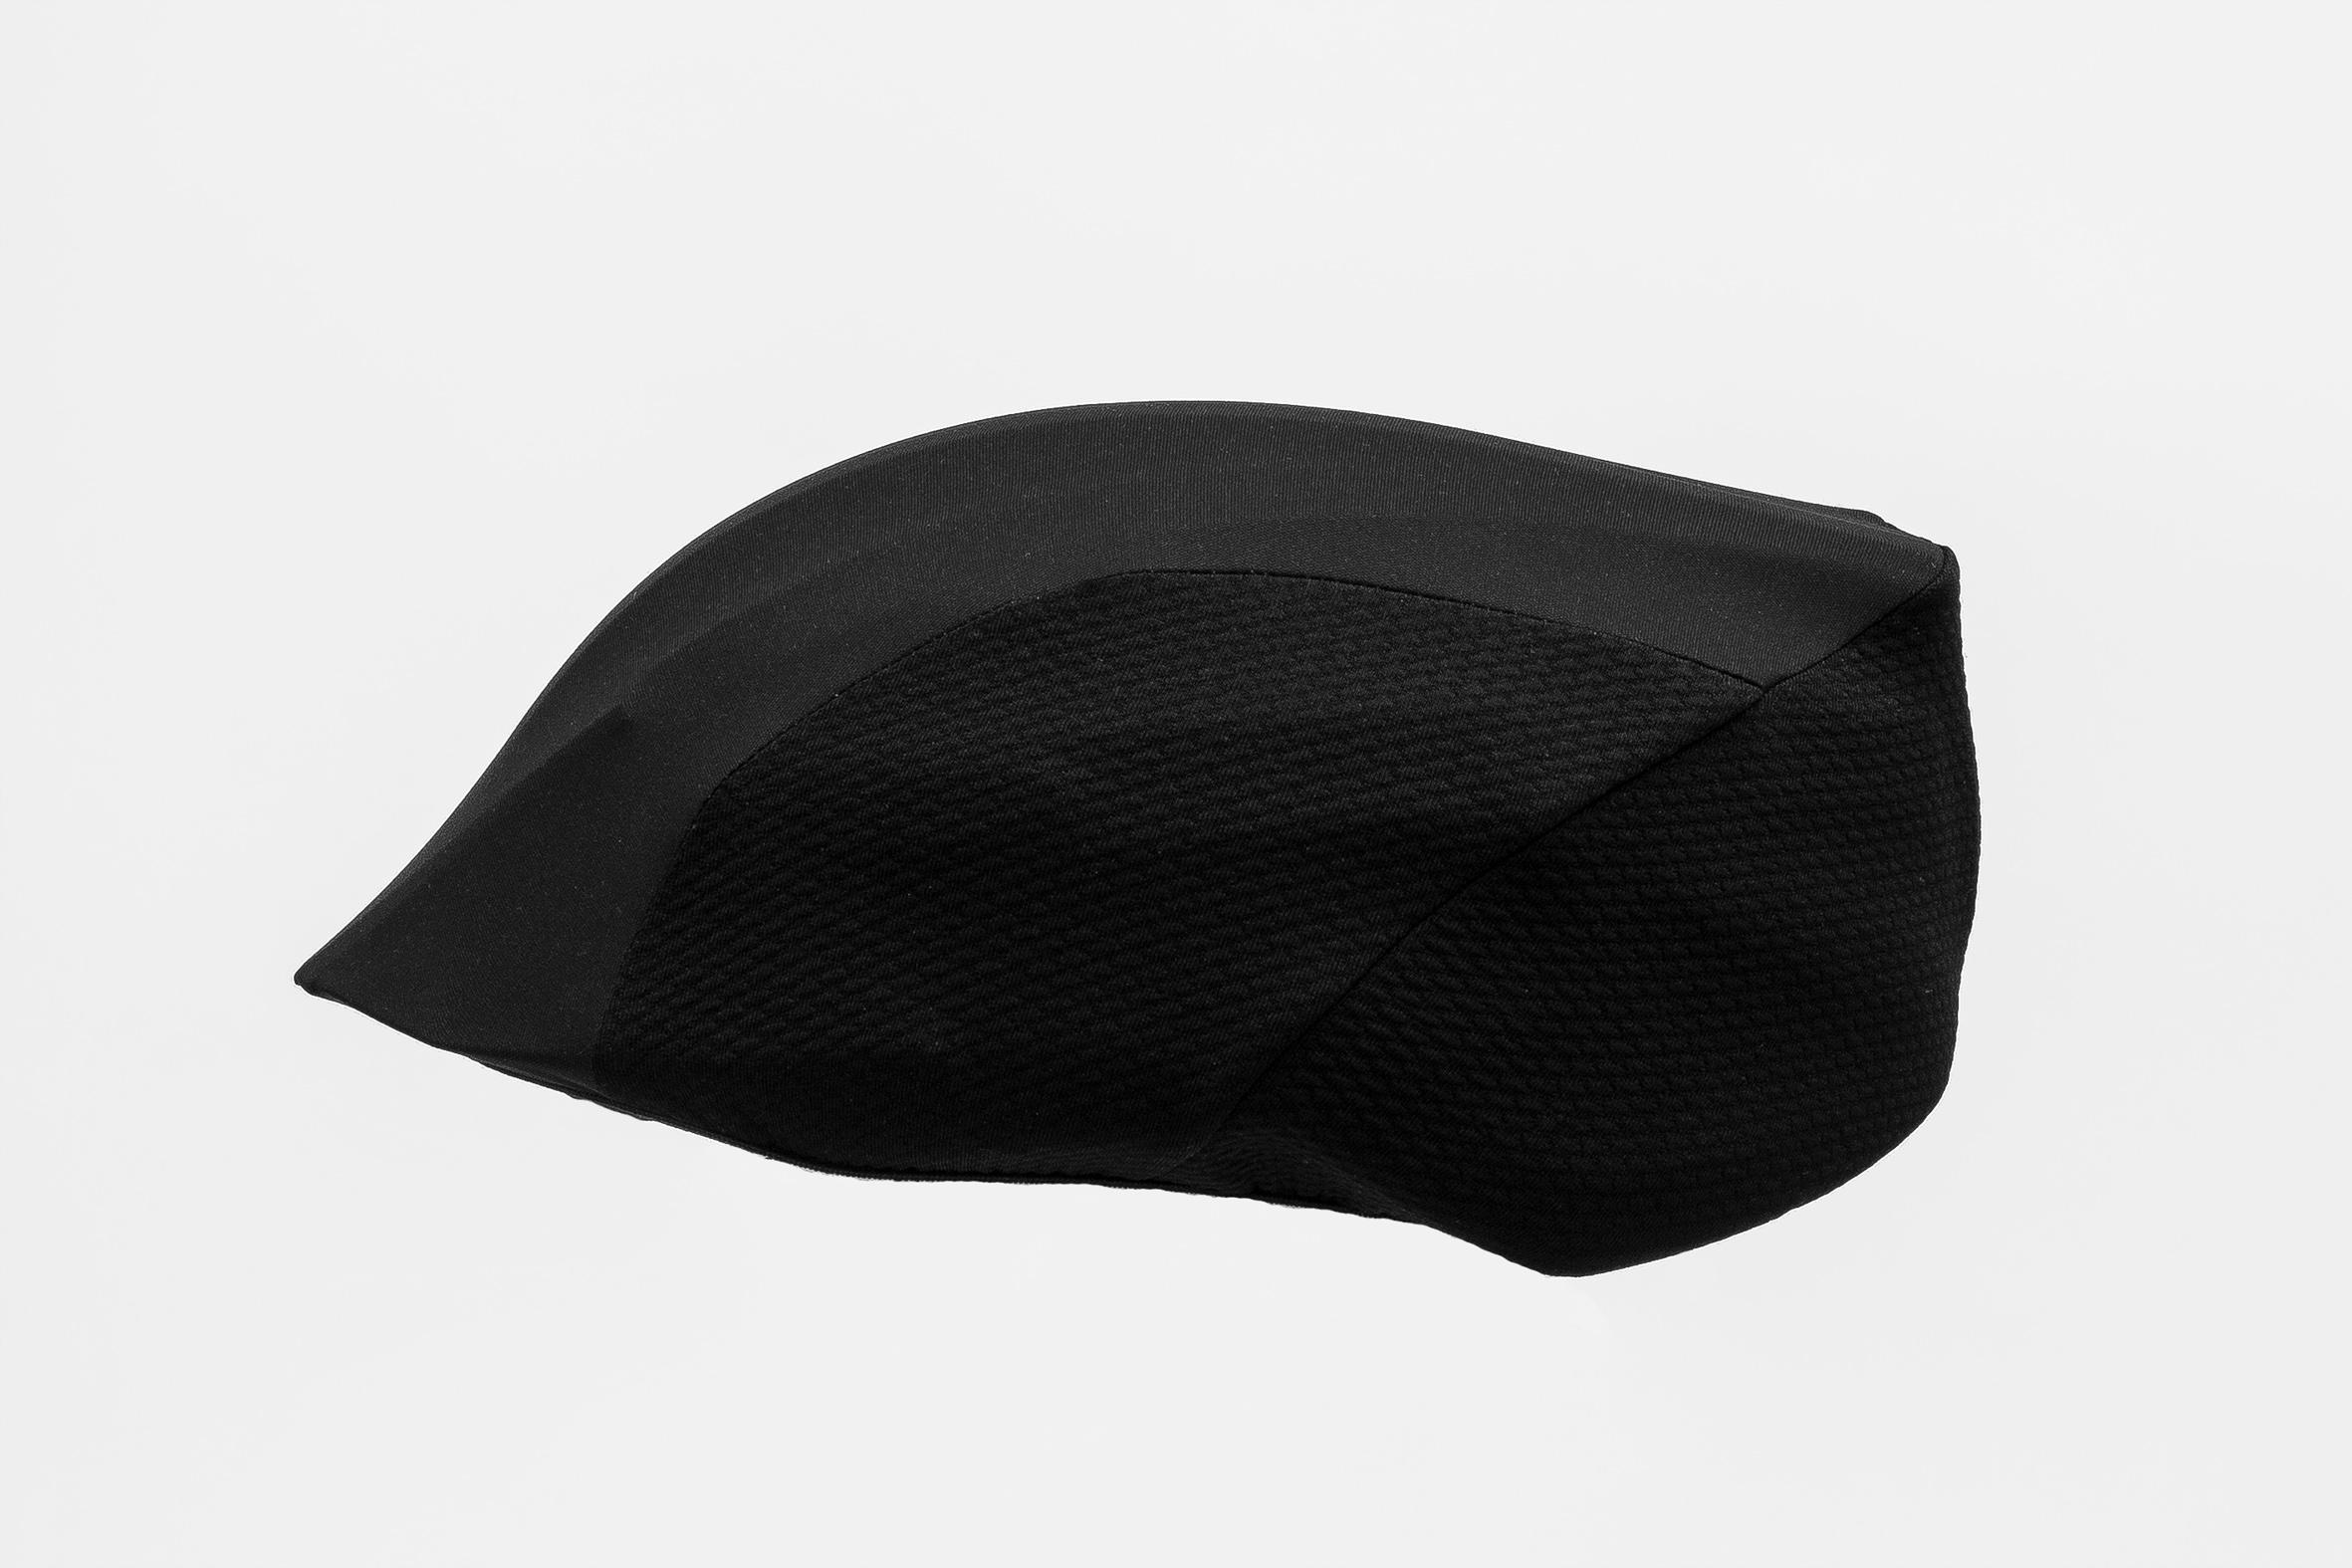 scalp fahrradhelm cover black